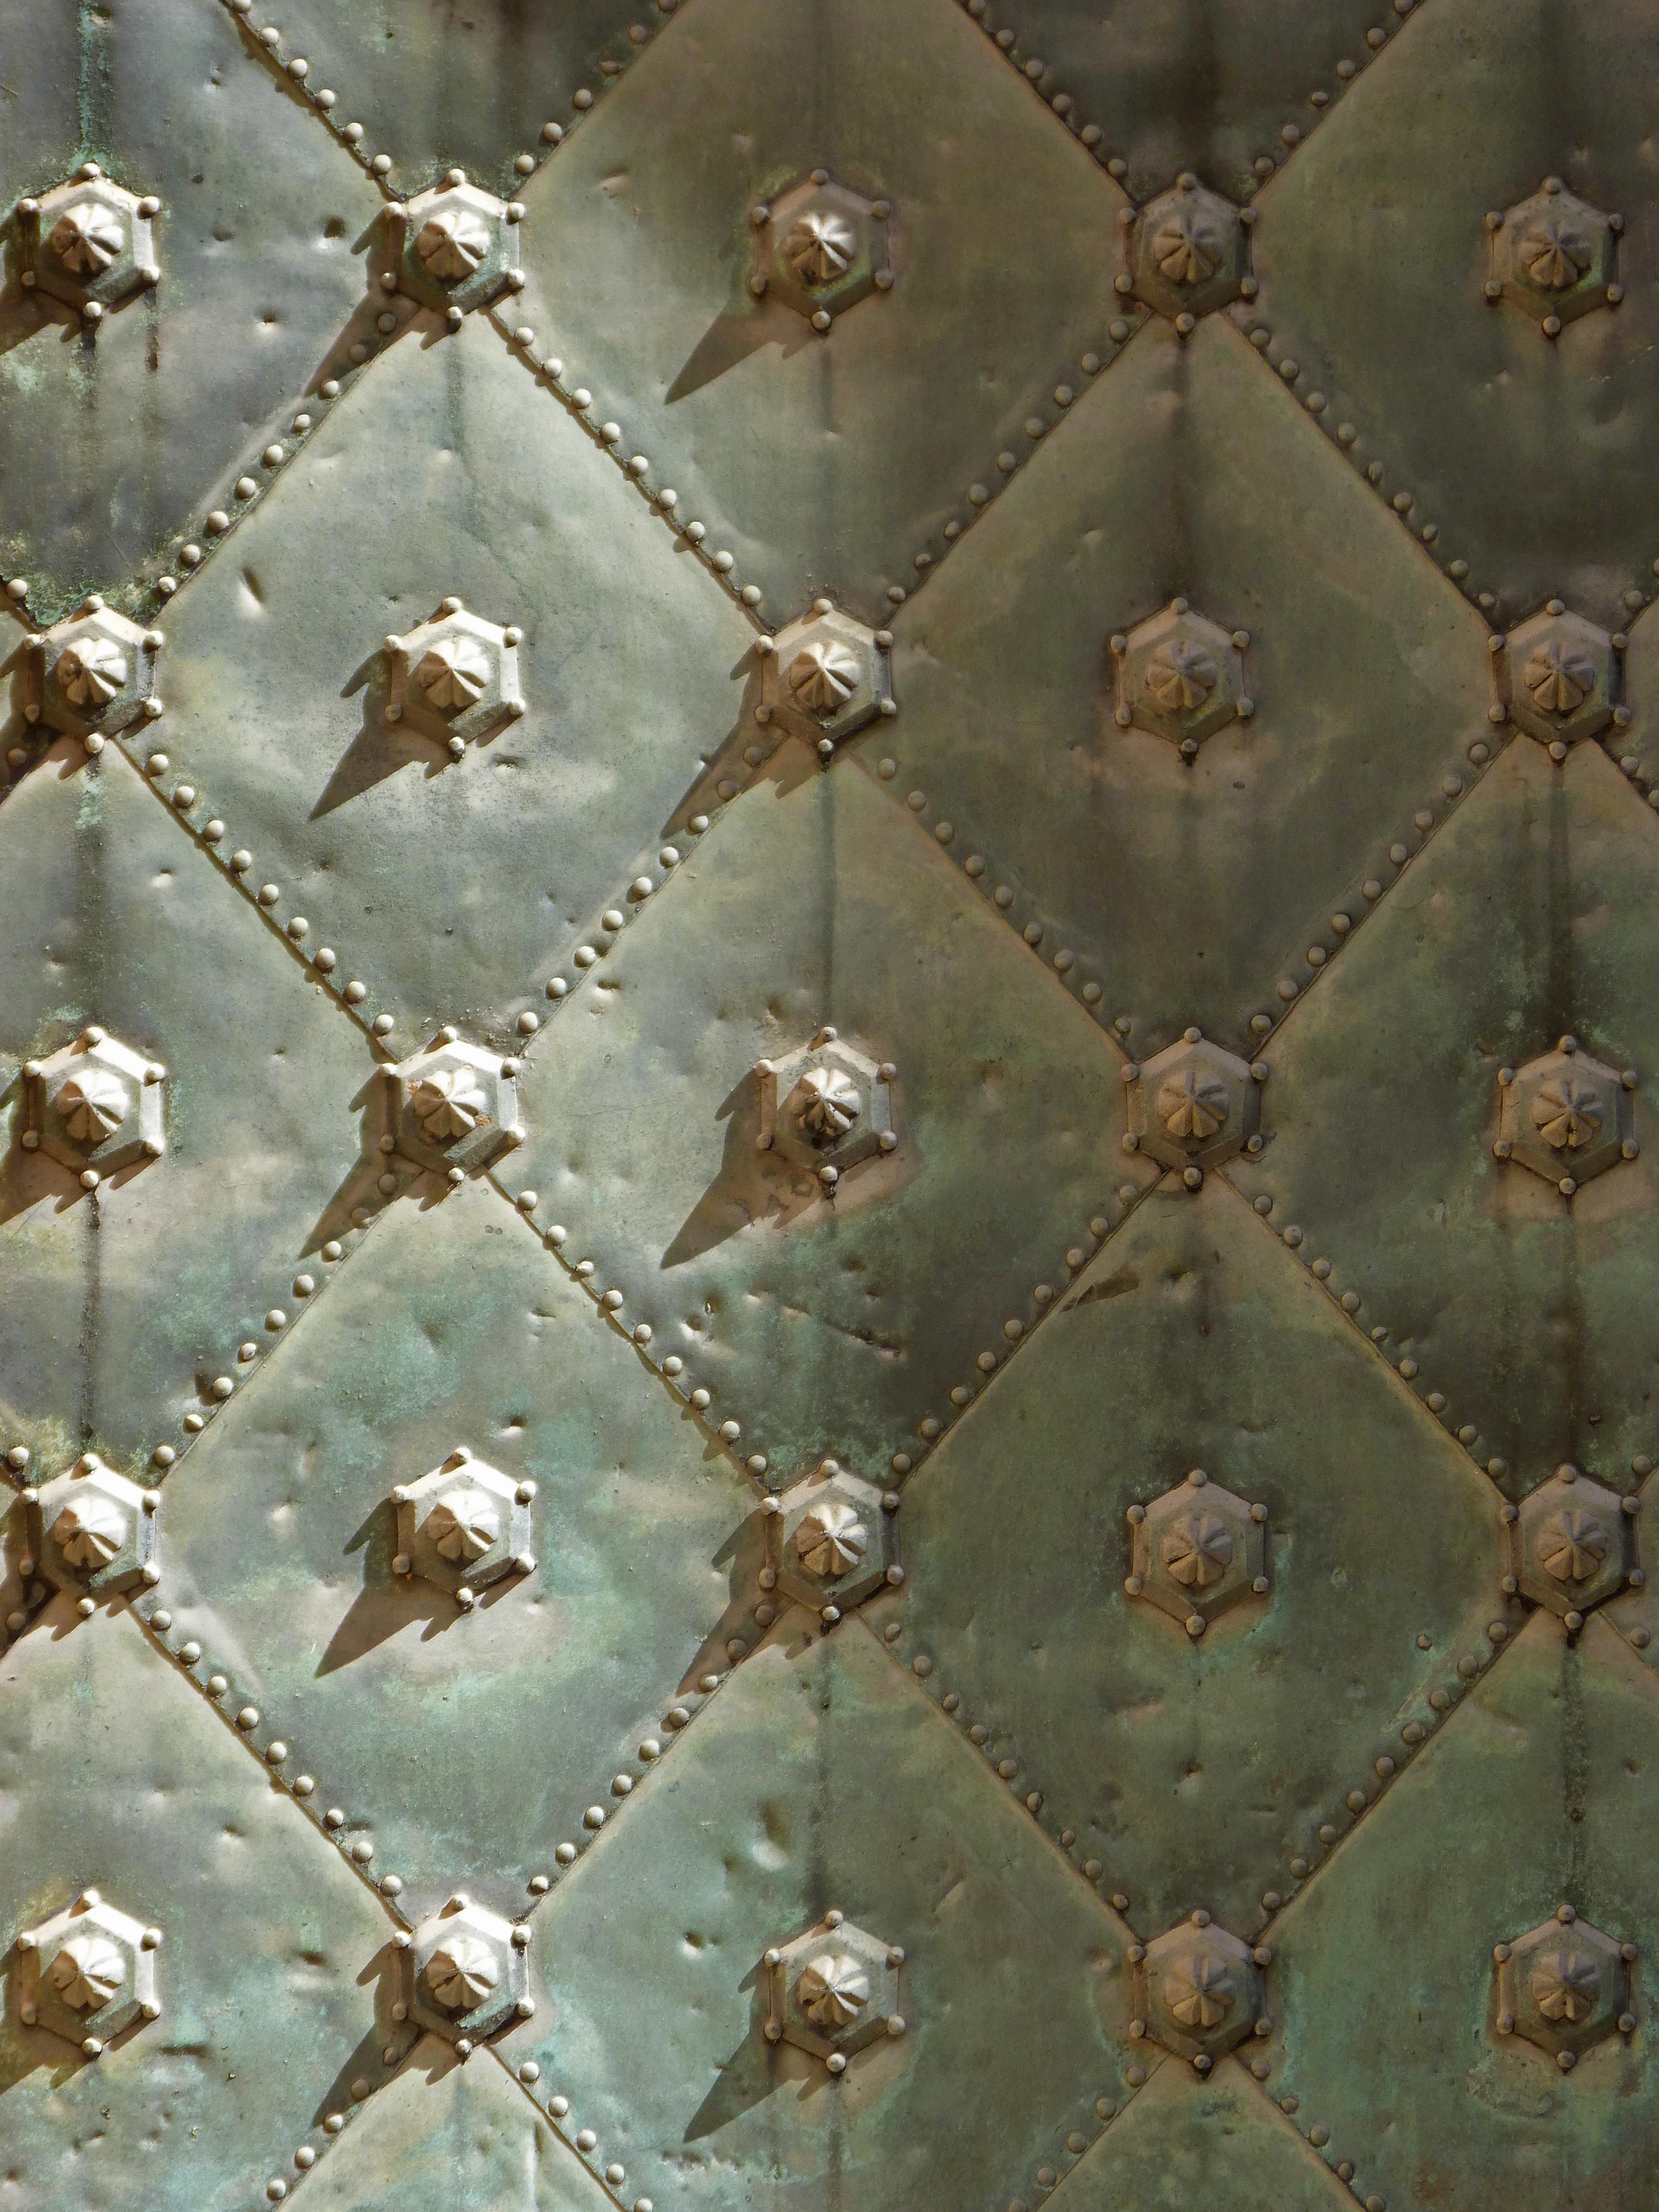 Fotos gratis : textura, hoja, patrón, puerta, art, pasado, diseño ...